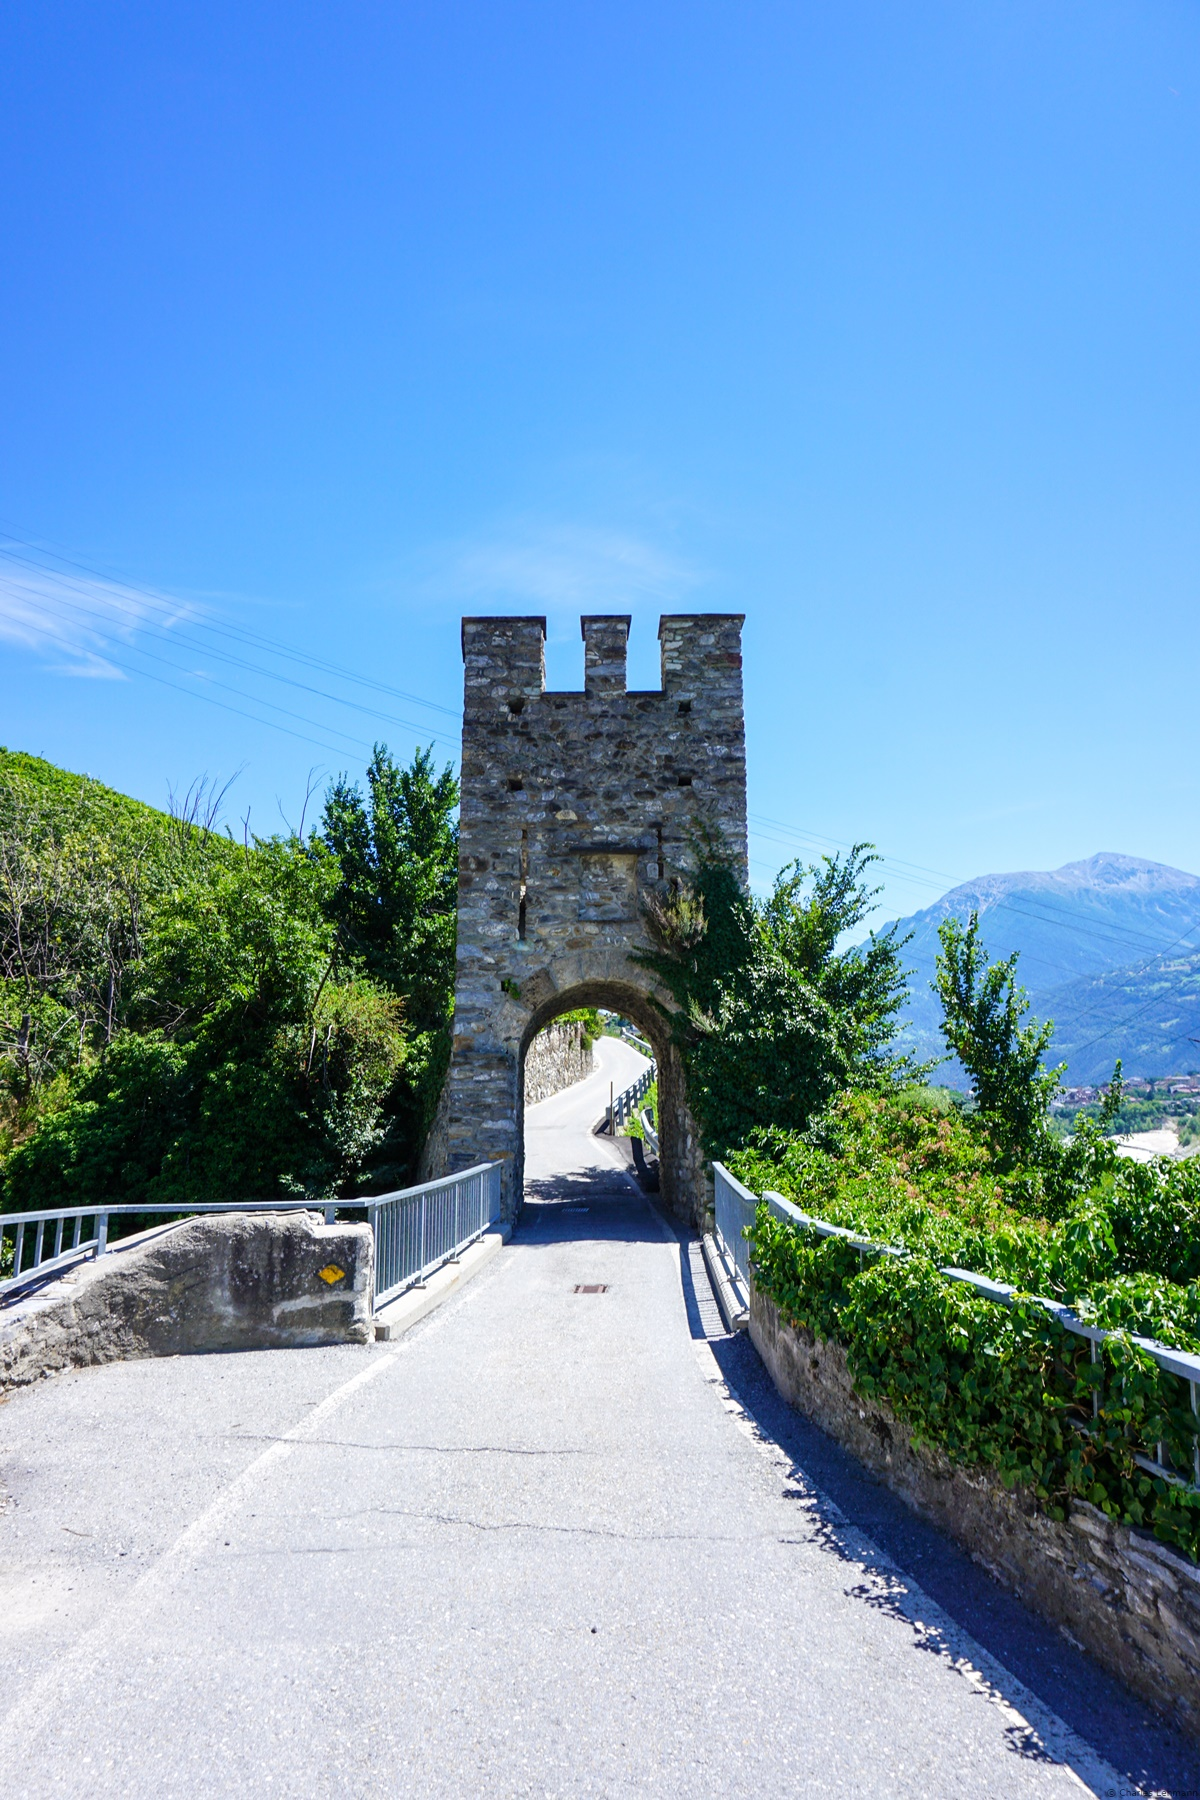 The old bridge over the Dala